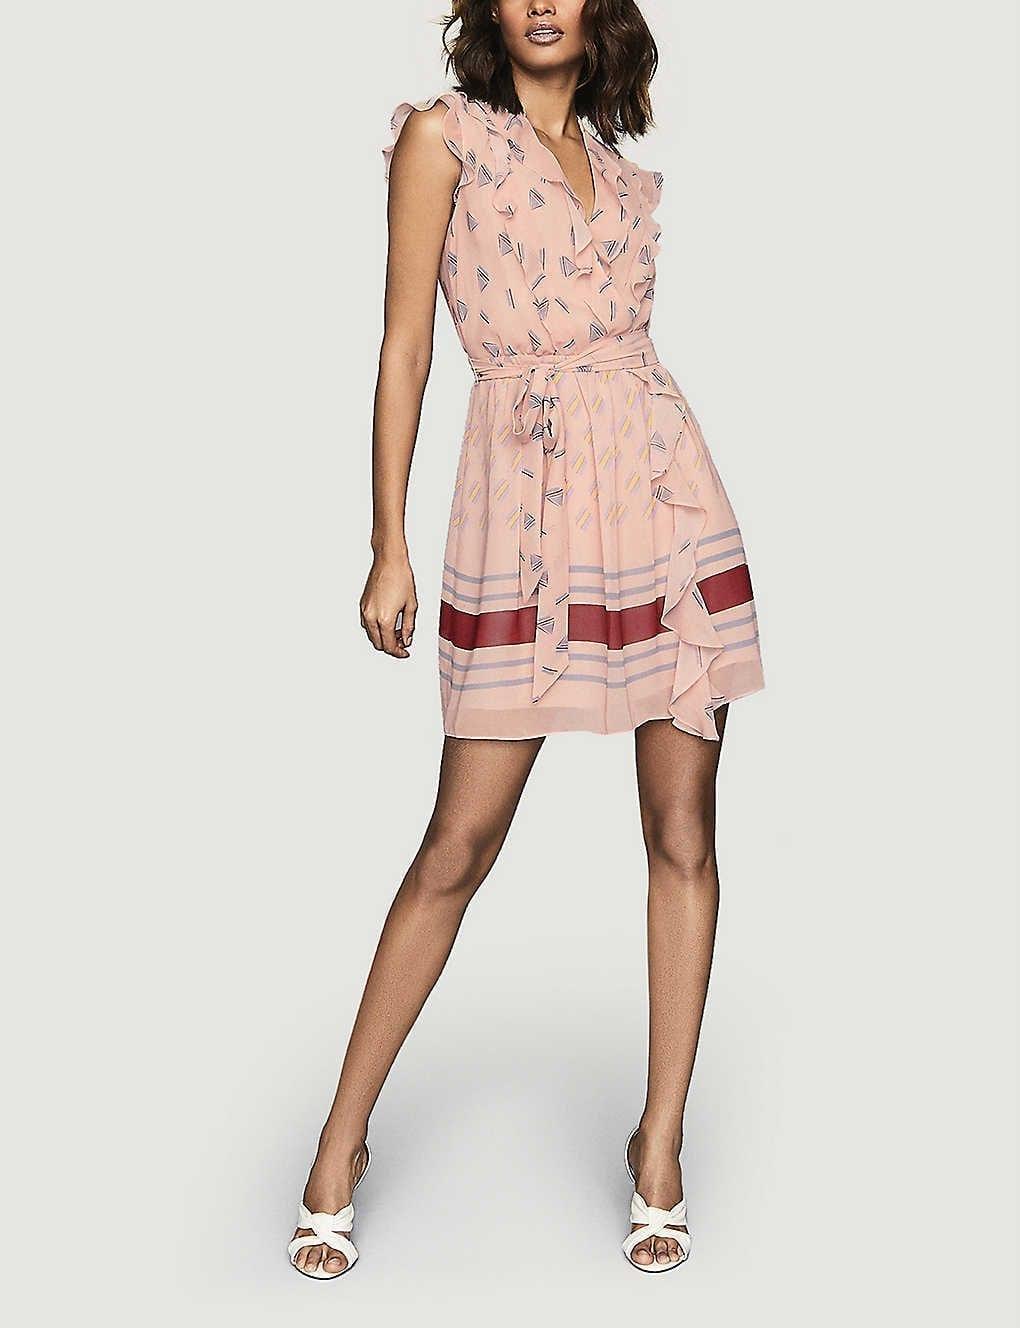 REISS Stephanie Printed Crepe Mini Dress